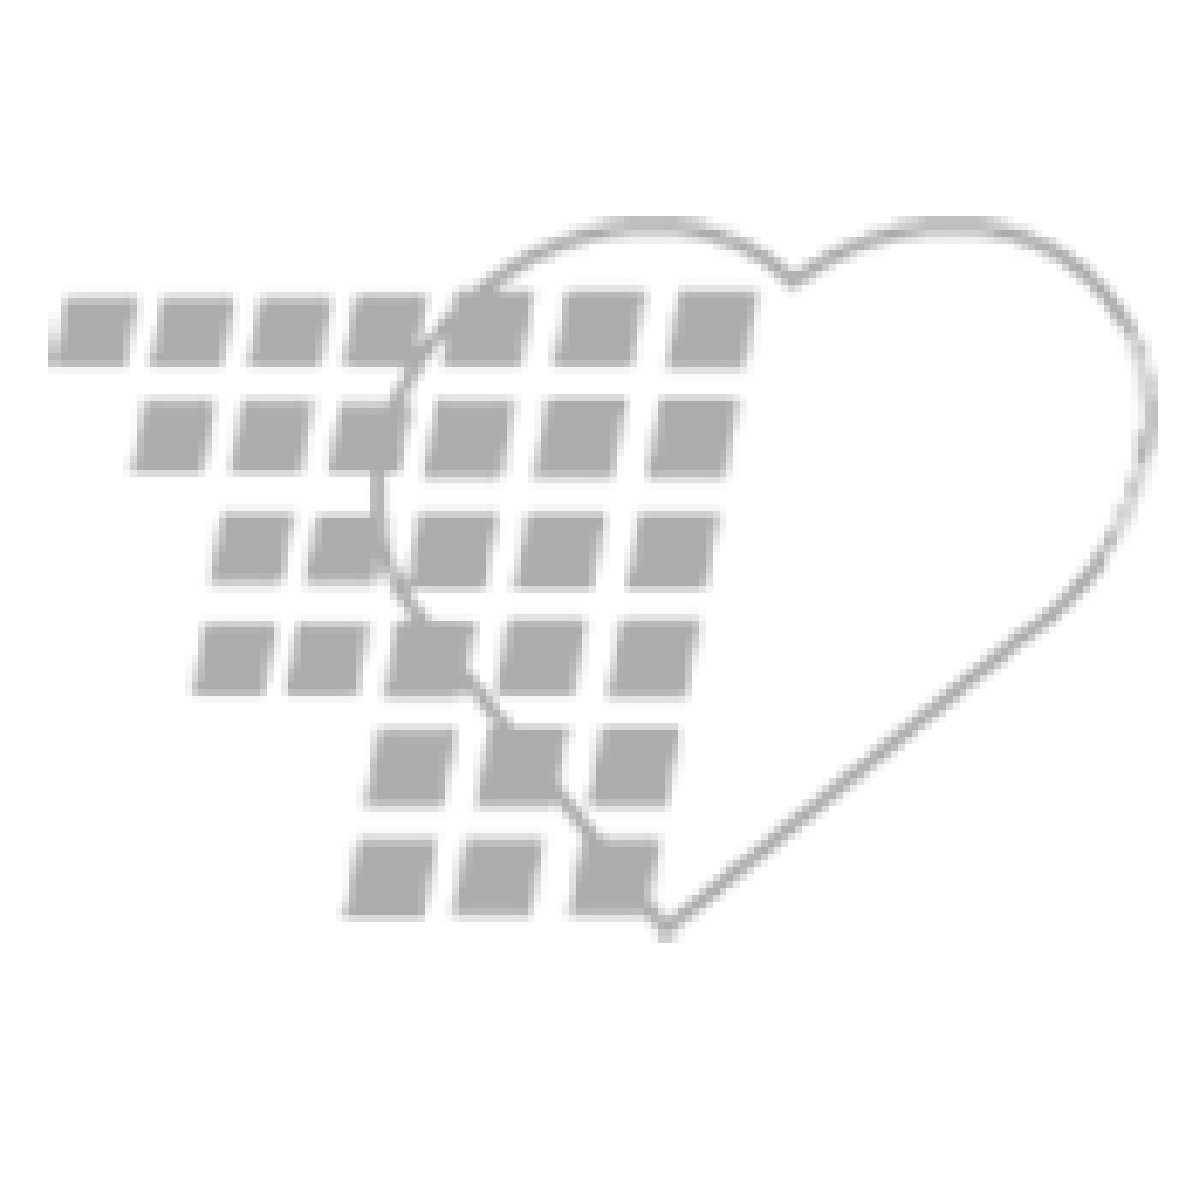 02-24-2020 - Filac   Probe Covers